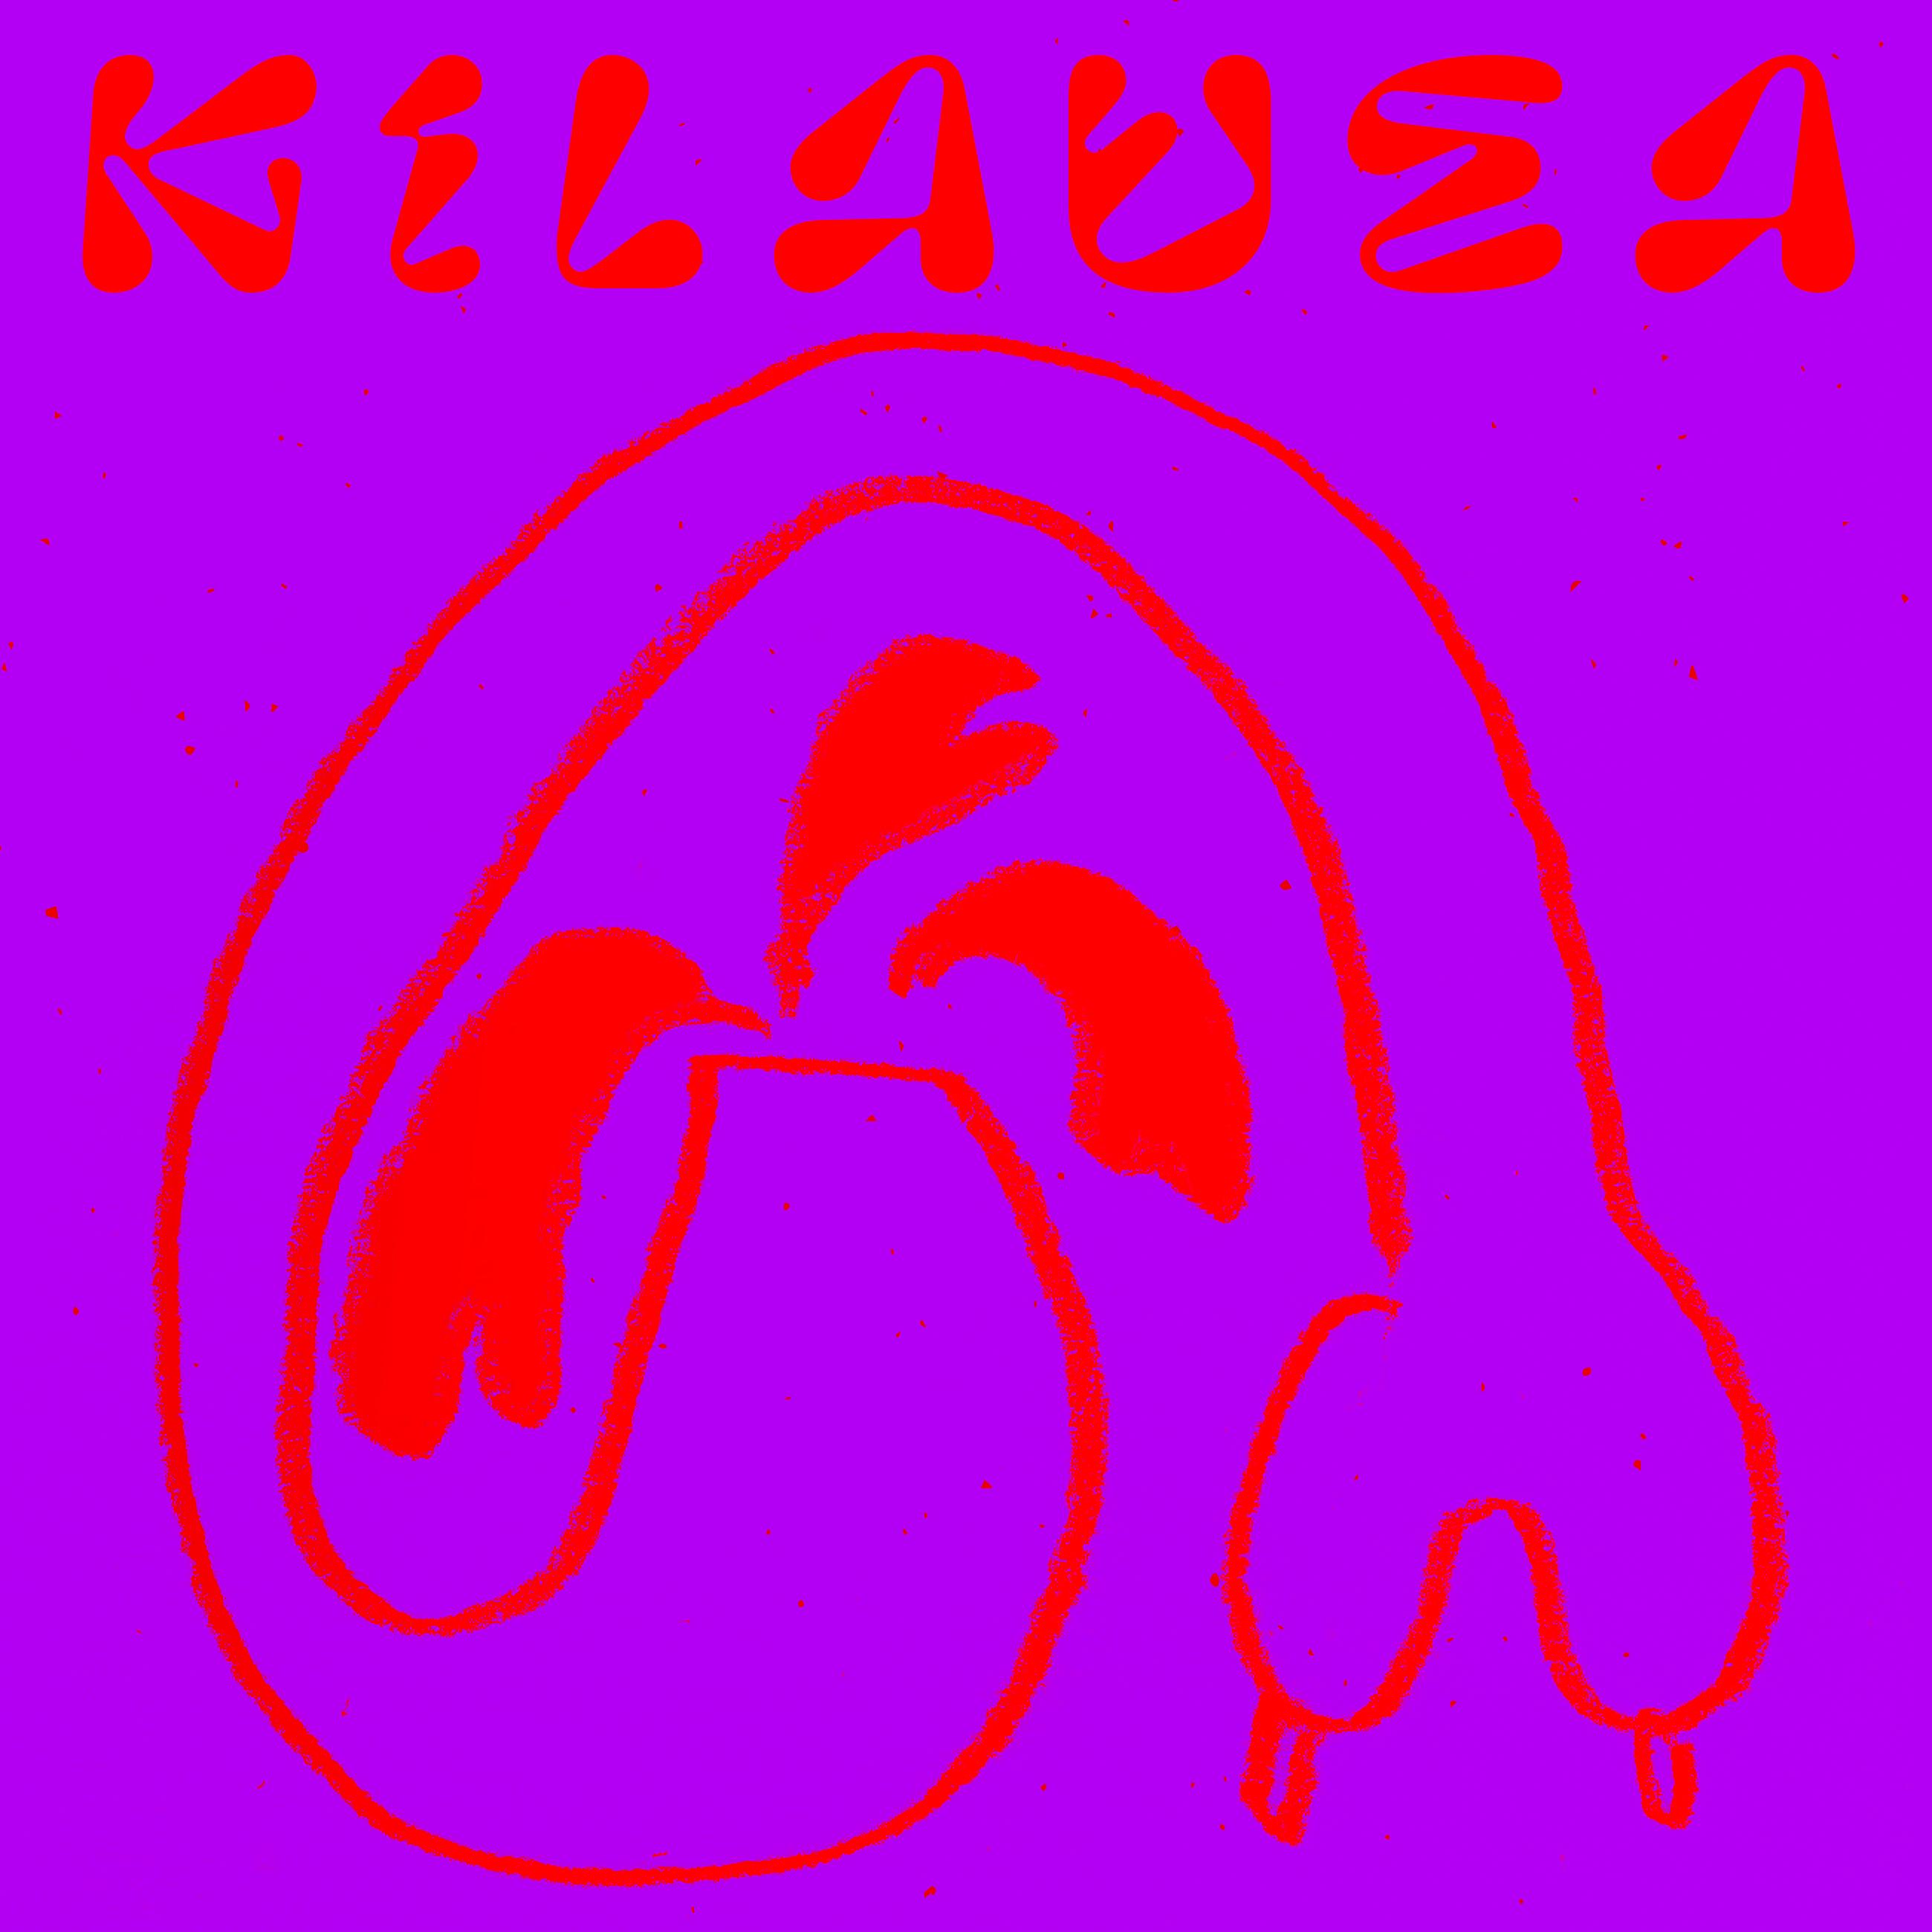 ink midget Kilauea couvre x chefs